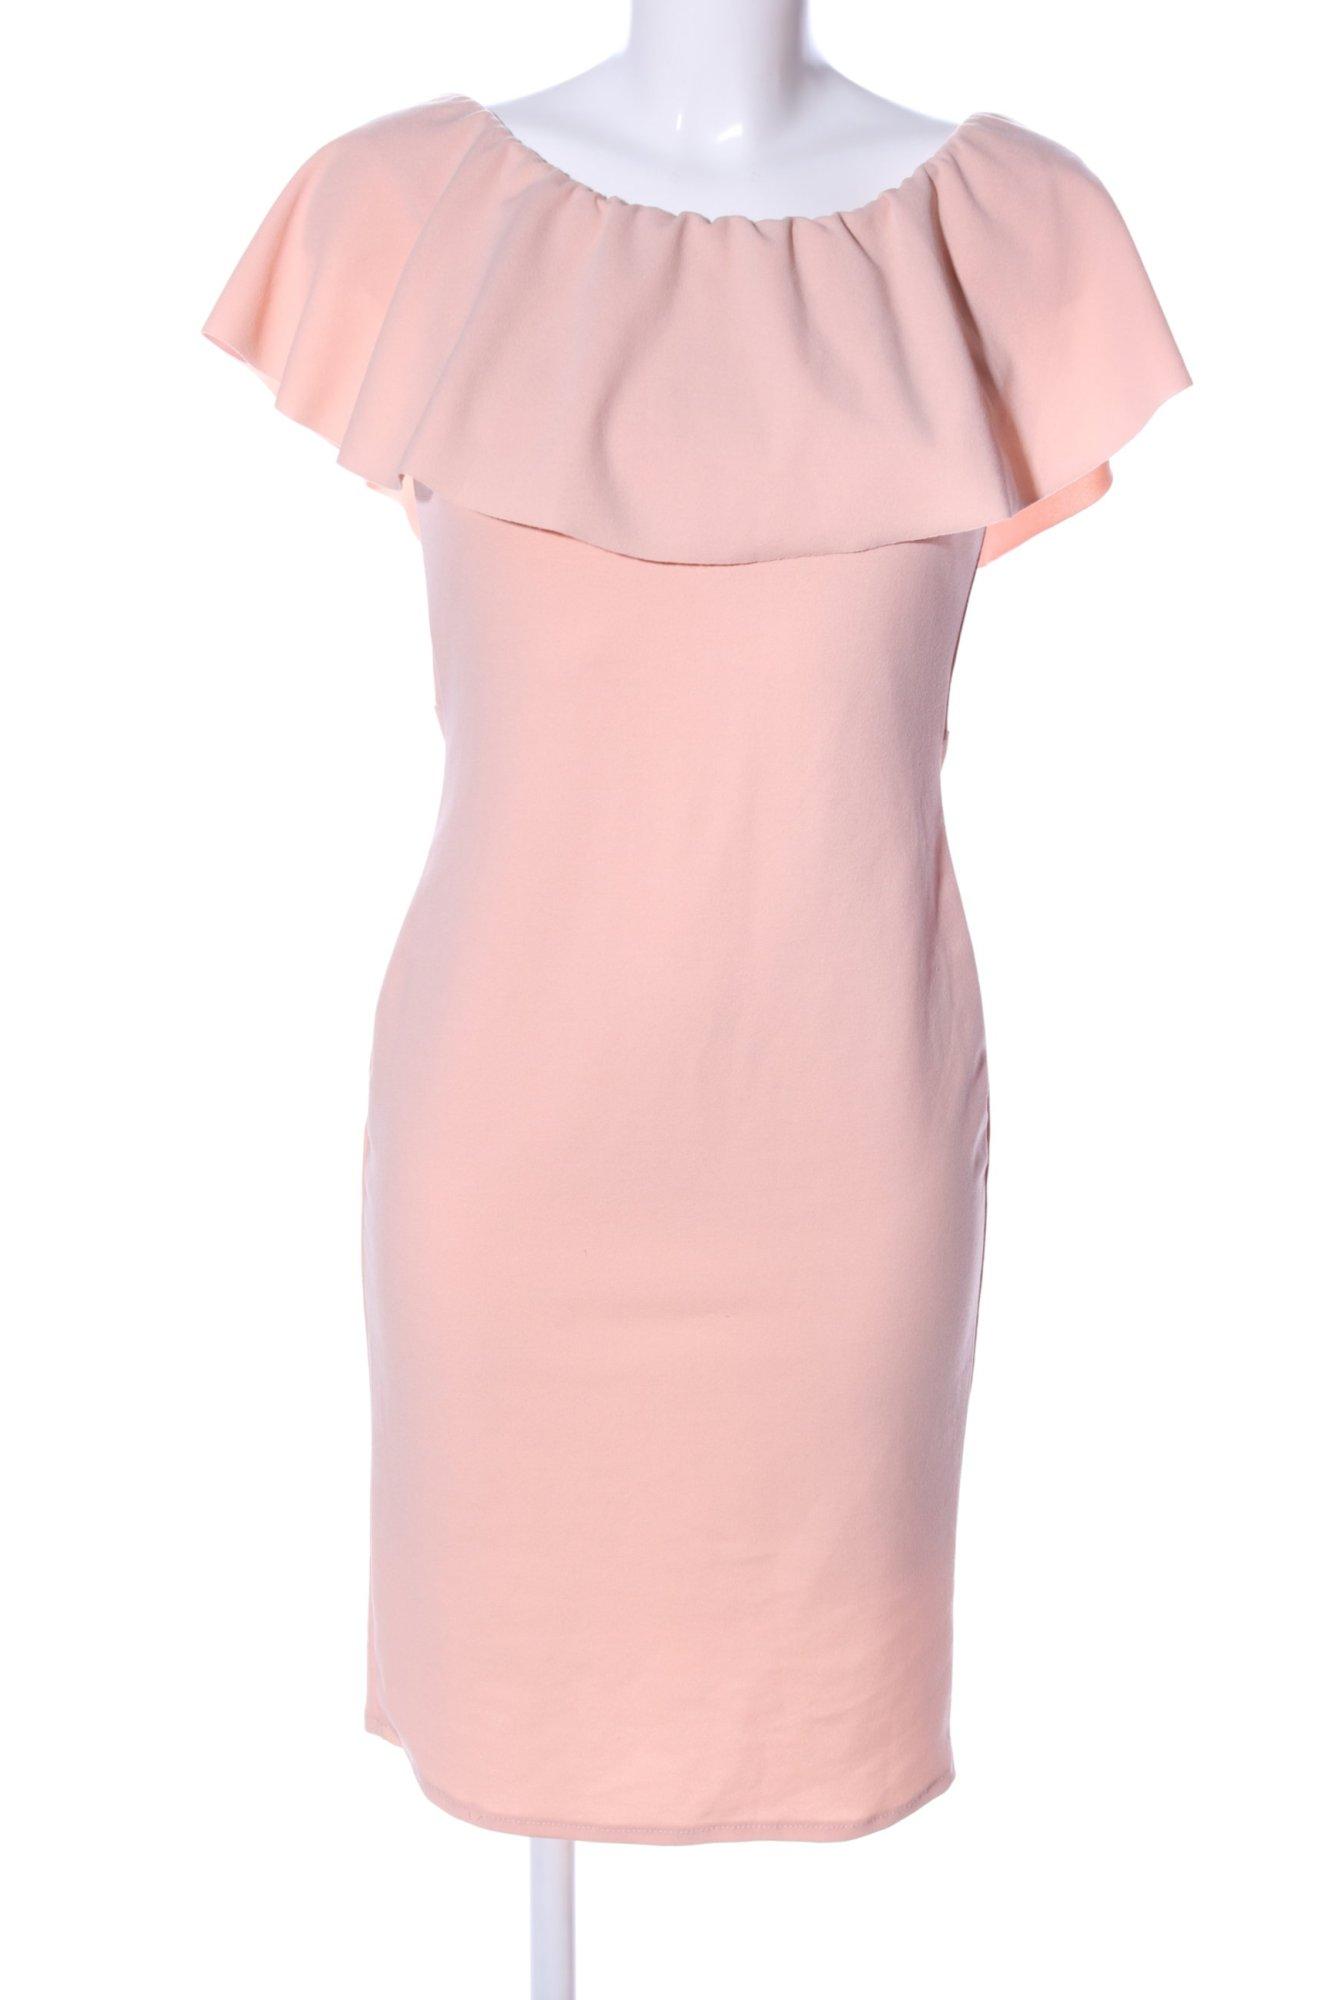 details zu pink lady cocktailkleid nude elegant damen gr. de 36 kleid dress  cocktail dress